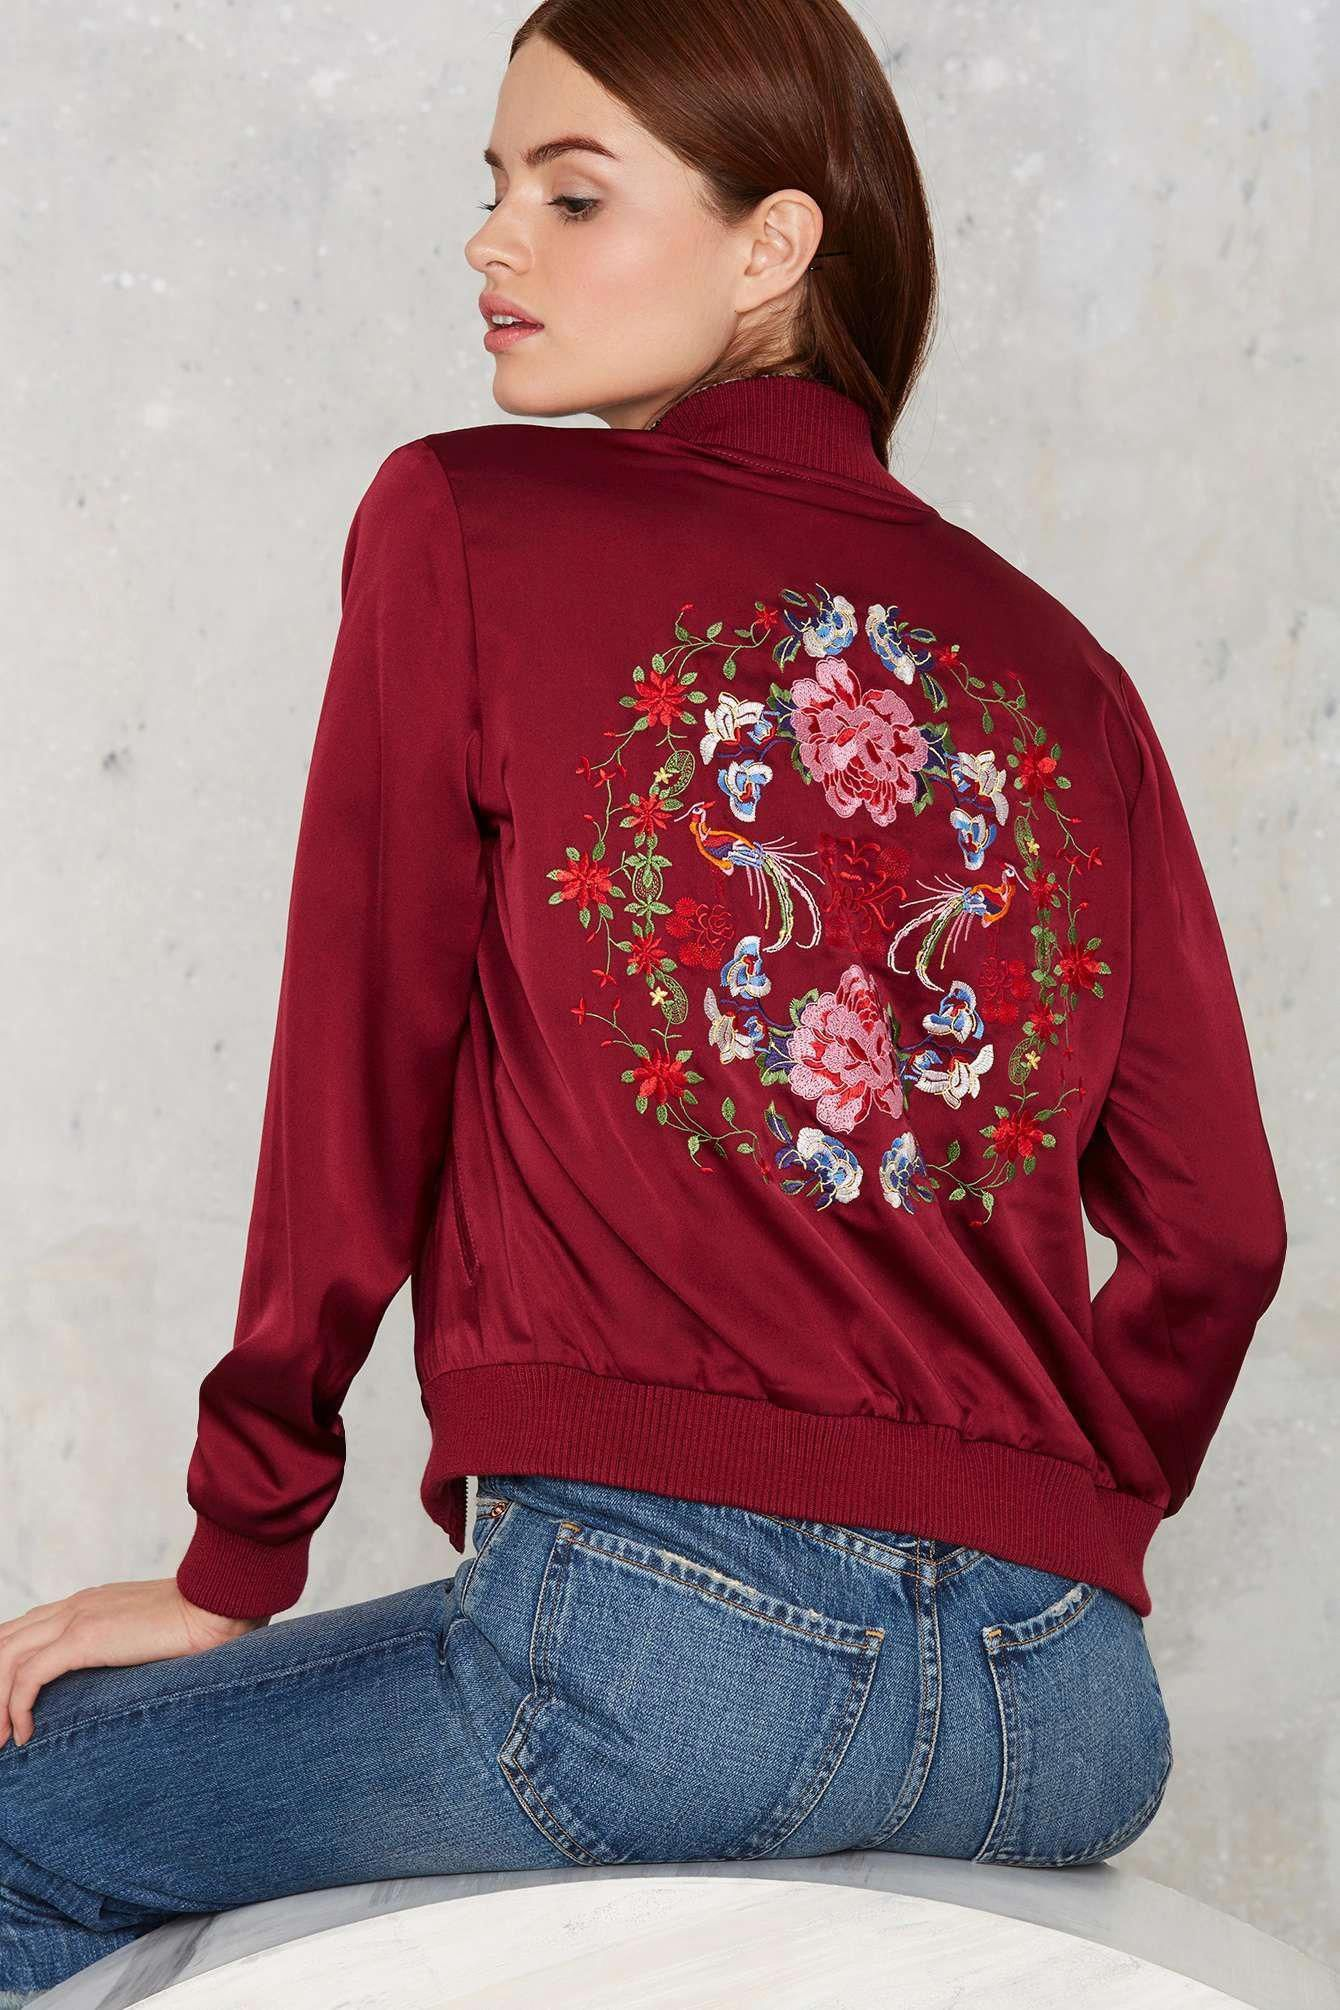 f7c63100b0007 Nasty Gal Flower Trip Bomber Jacket | Shop Clothes at Nasty Gal!  #KWayWomensaustruRaincoat